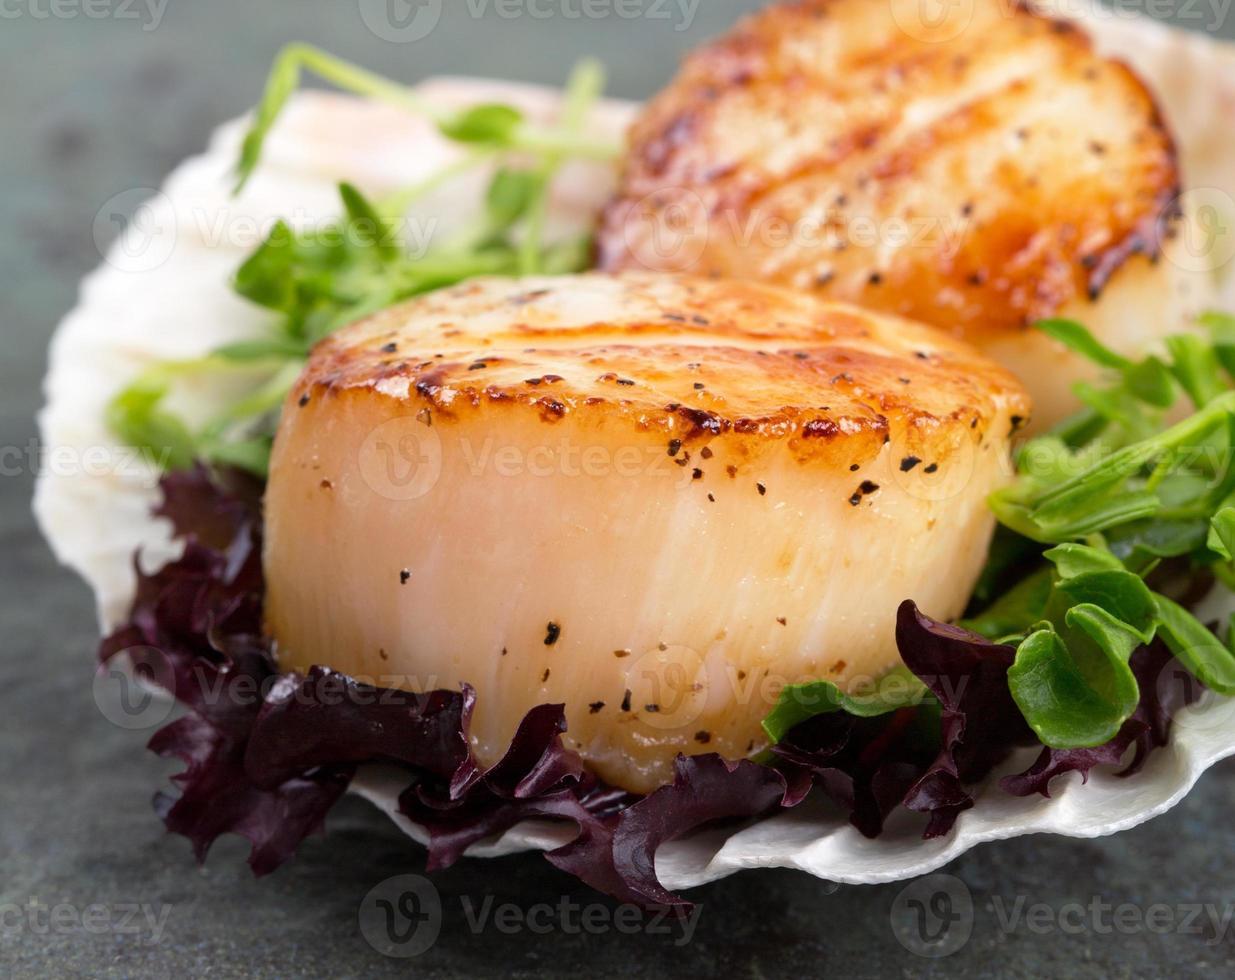 Seared scallops on lettuce photo